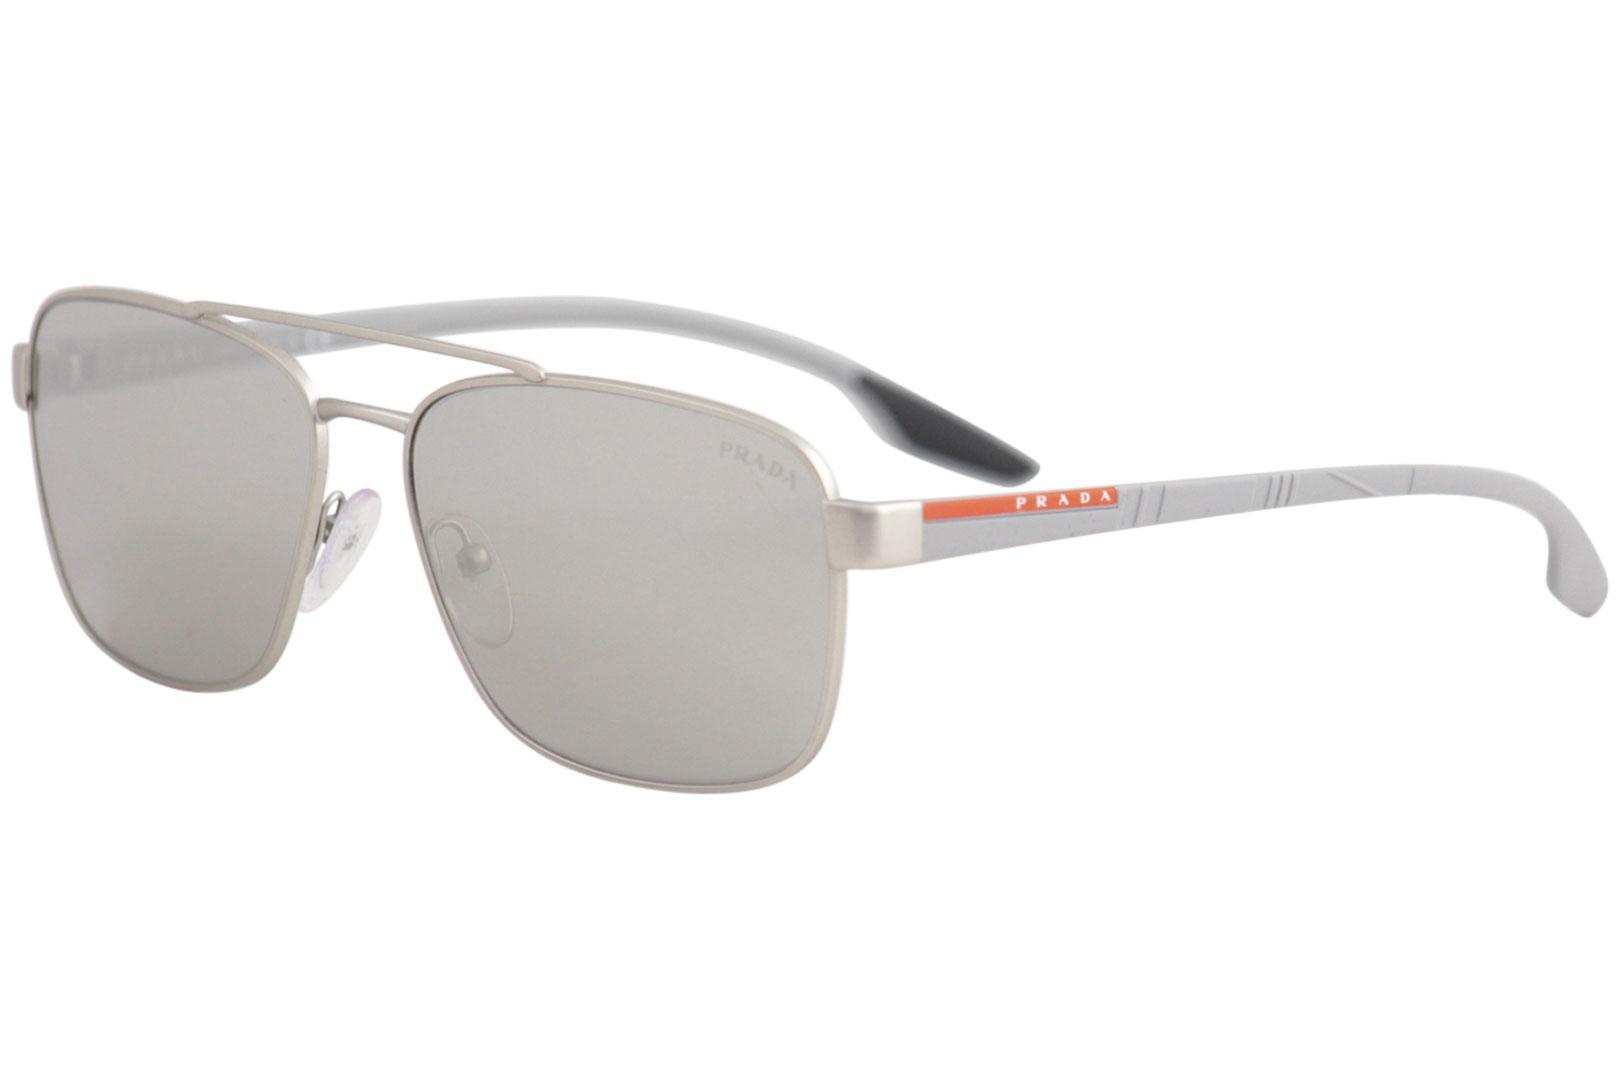 7021413ccd6f Prada Men s Linea Rossa SPS51U SPS 51 U Fashion Pilot Sunglasses